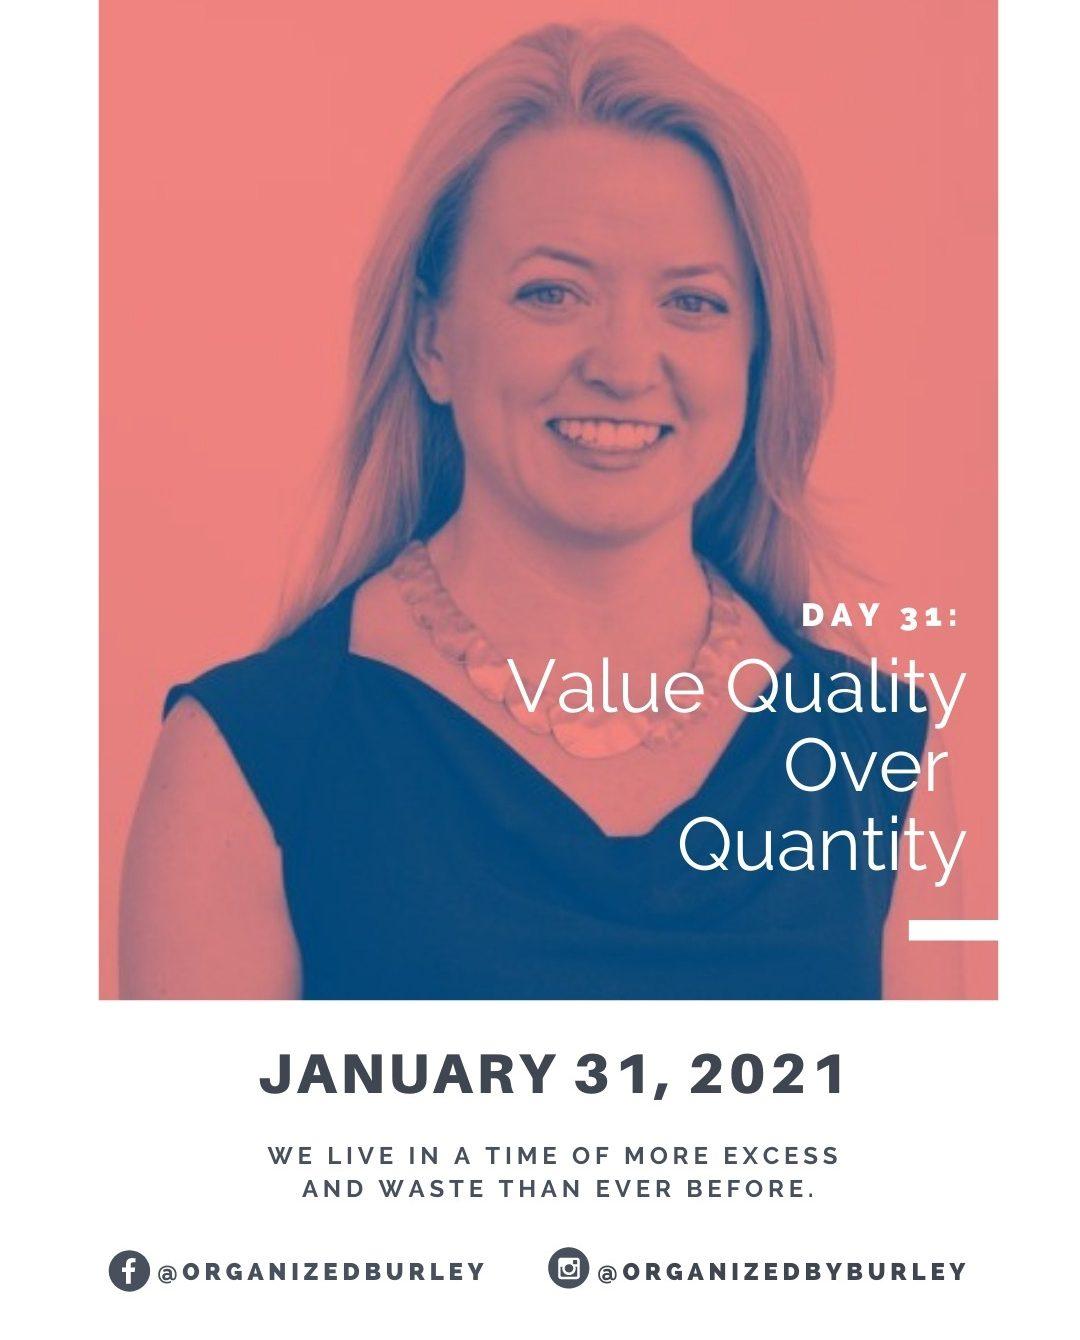 Katy Burley Professional organizer